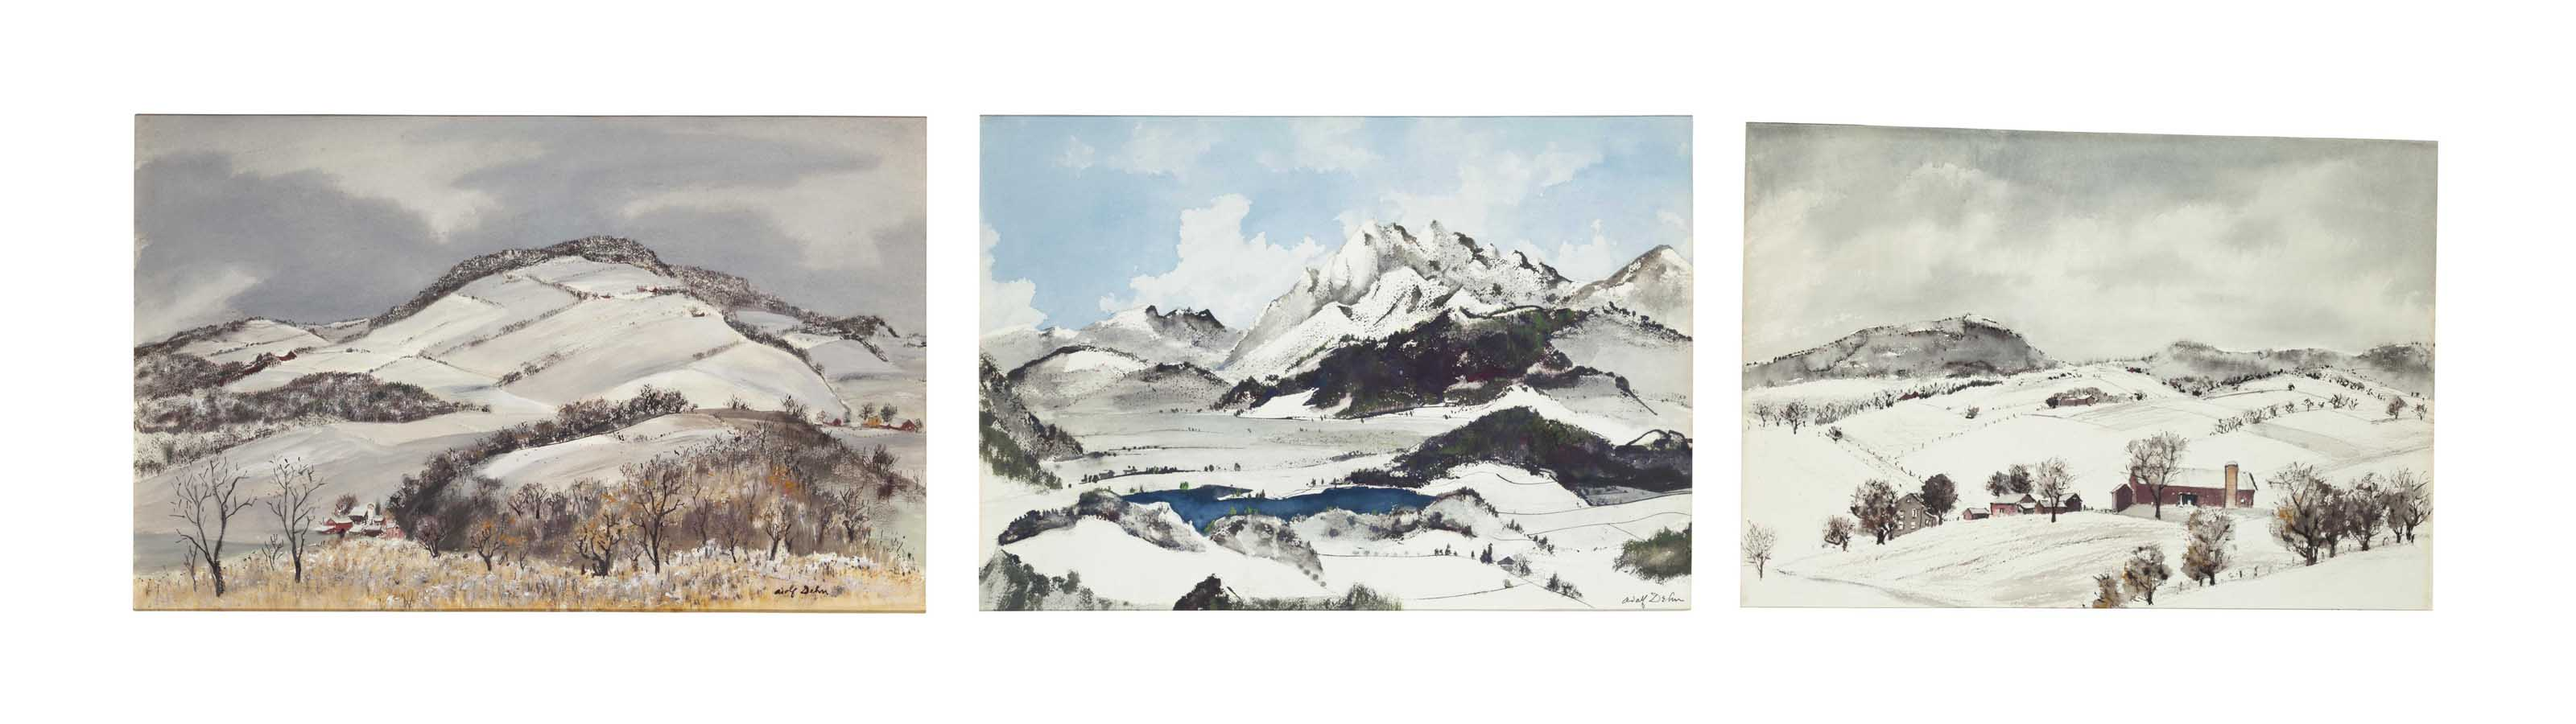 Winter landscapes (three works)